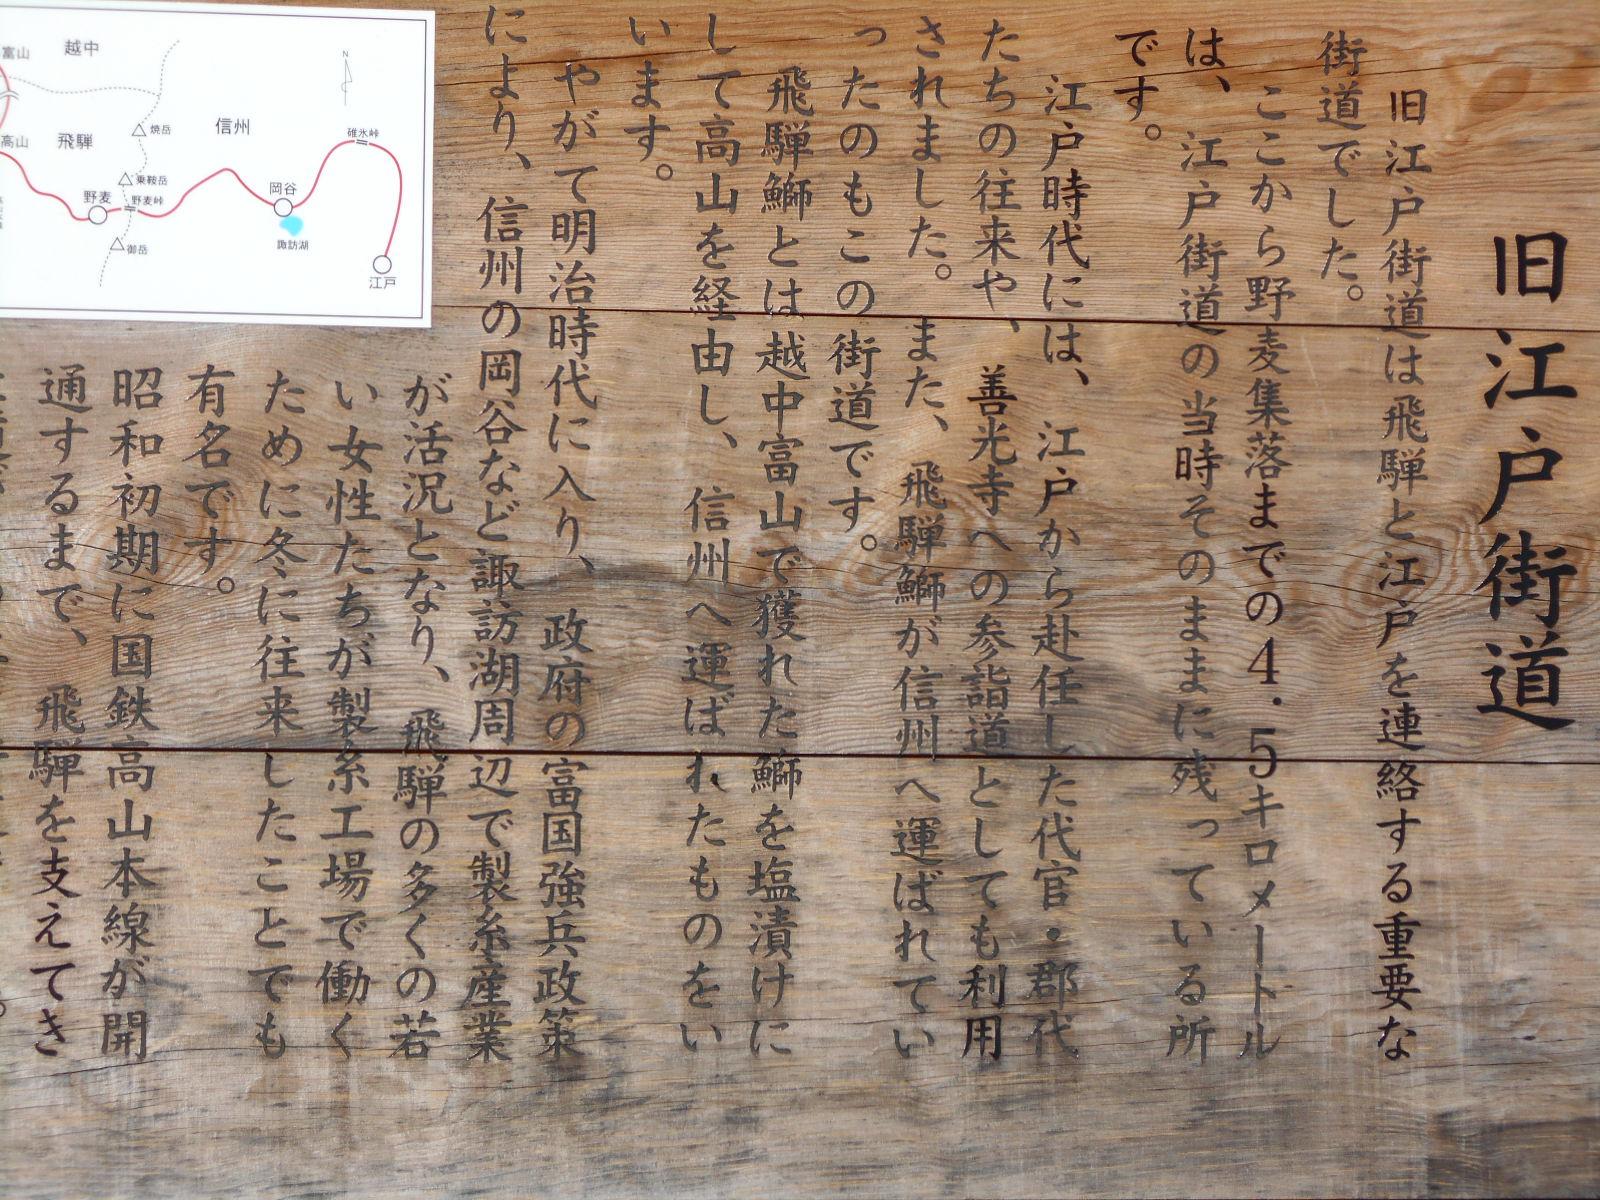 旧江戸街道の歴史